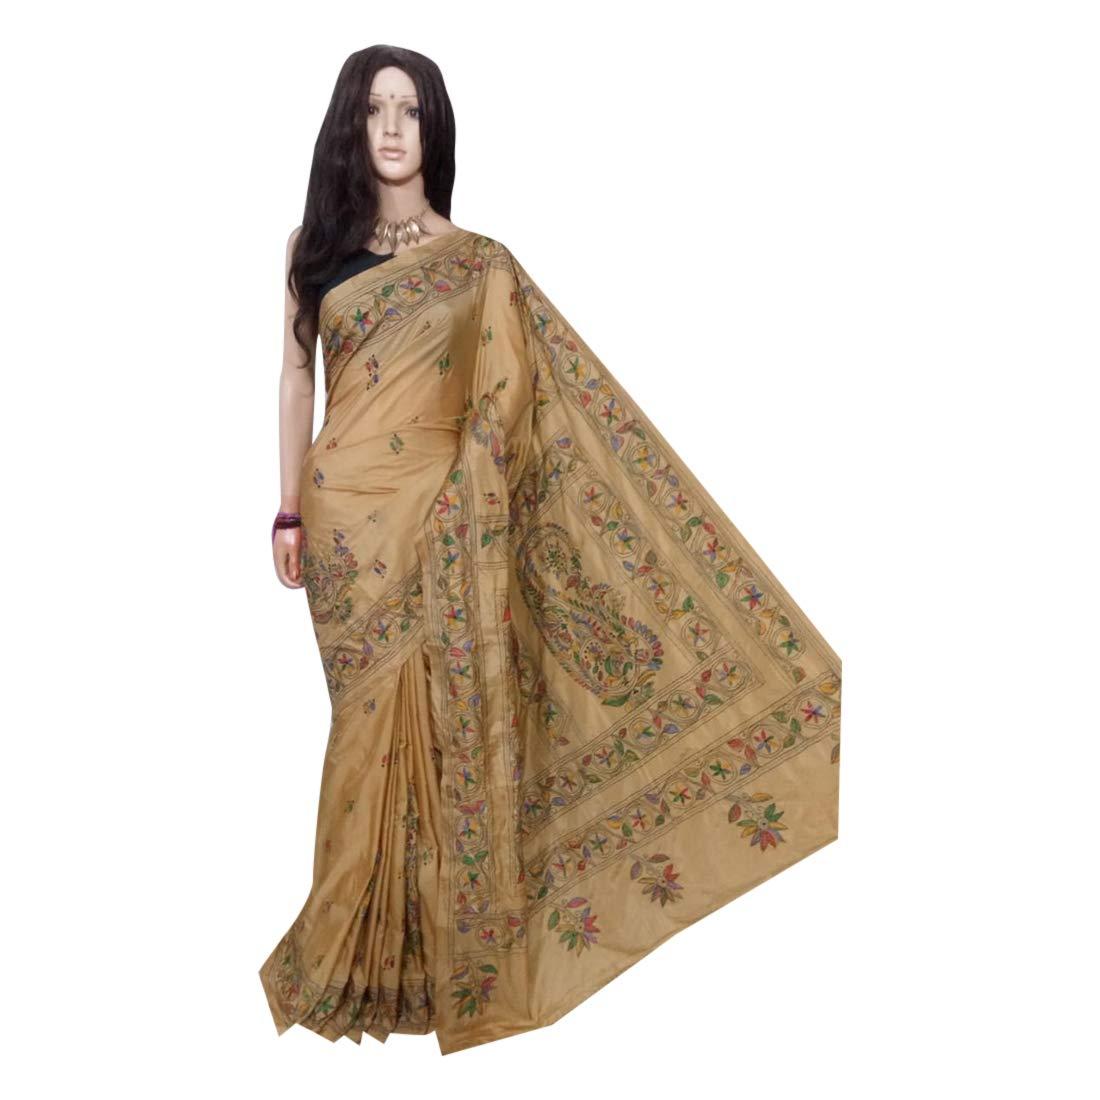 Kantha Stitch Art Silk Handmade Saree with Heavy wokr on Pallu Sari Blouse Indian from West Bengal 143a